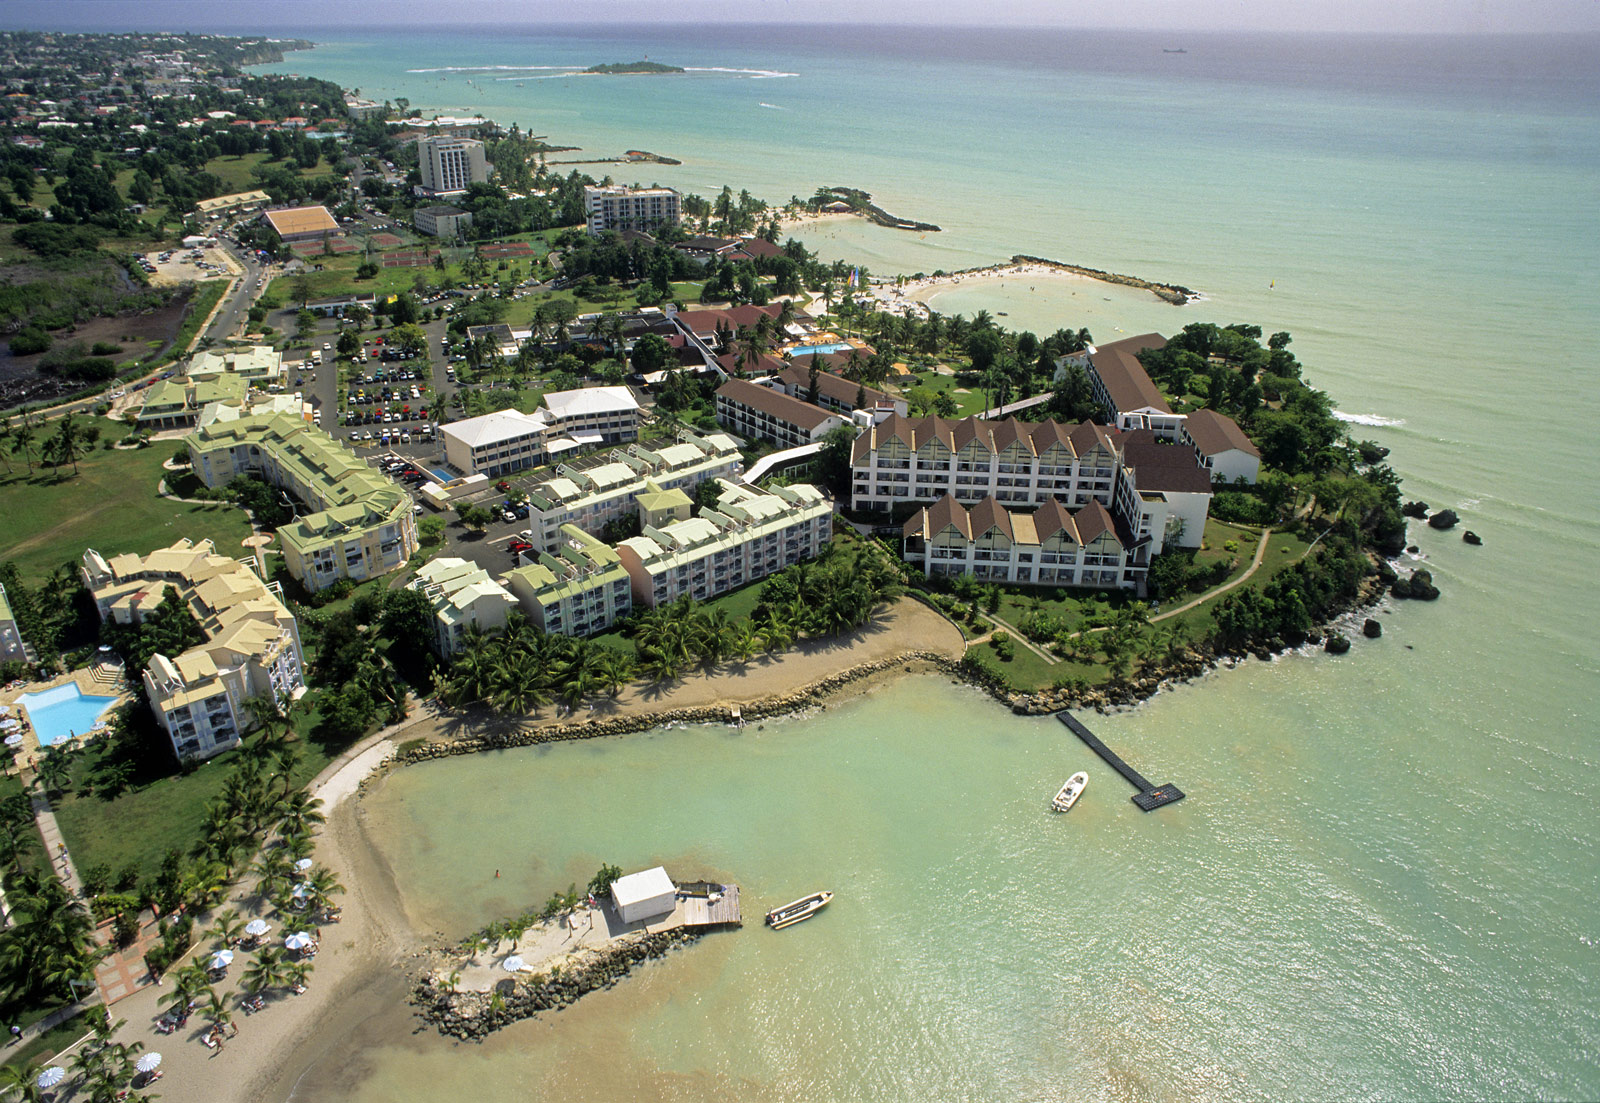 http://www.deshotelsetdesiles.com/hotel-vol-guadeloupe/photos/vue-aerienne-dun-complexe-.jpg